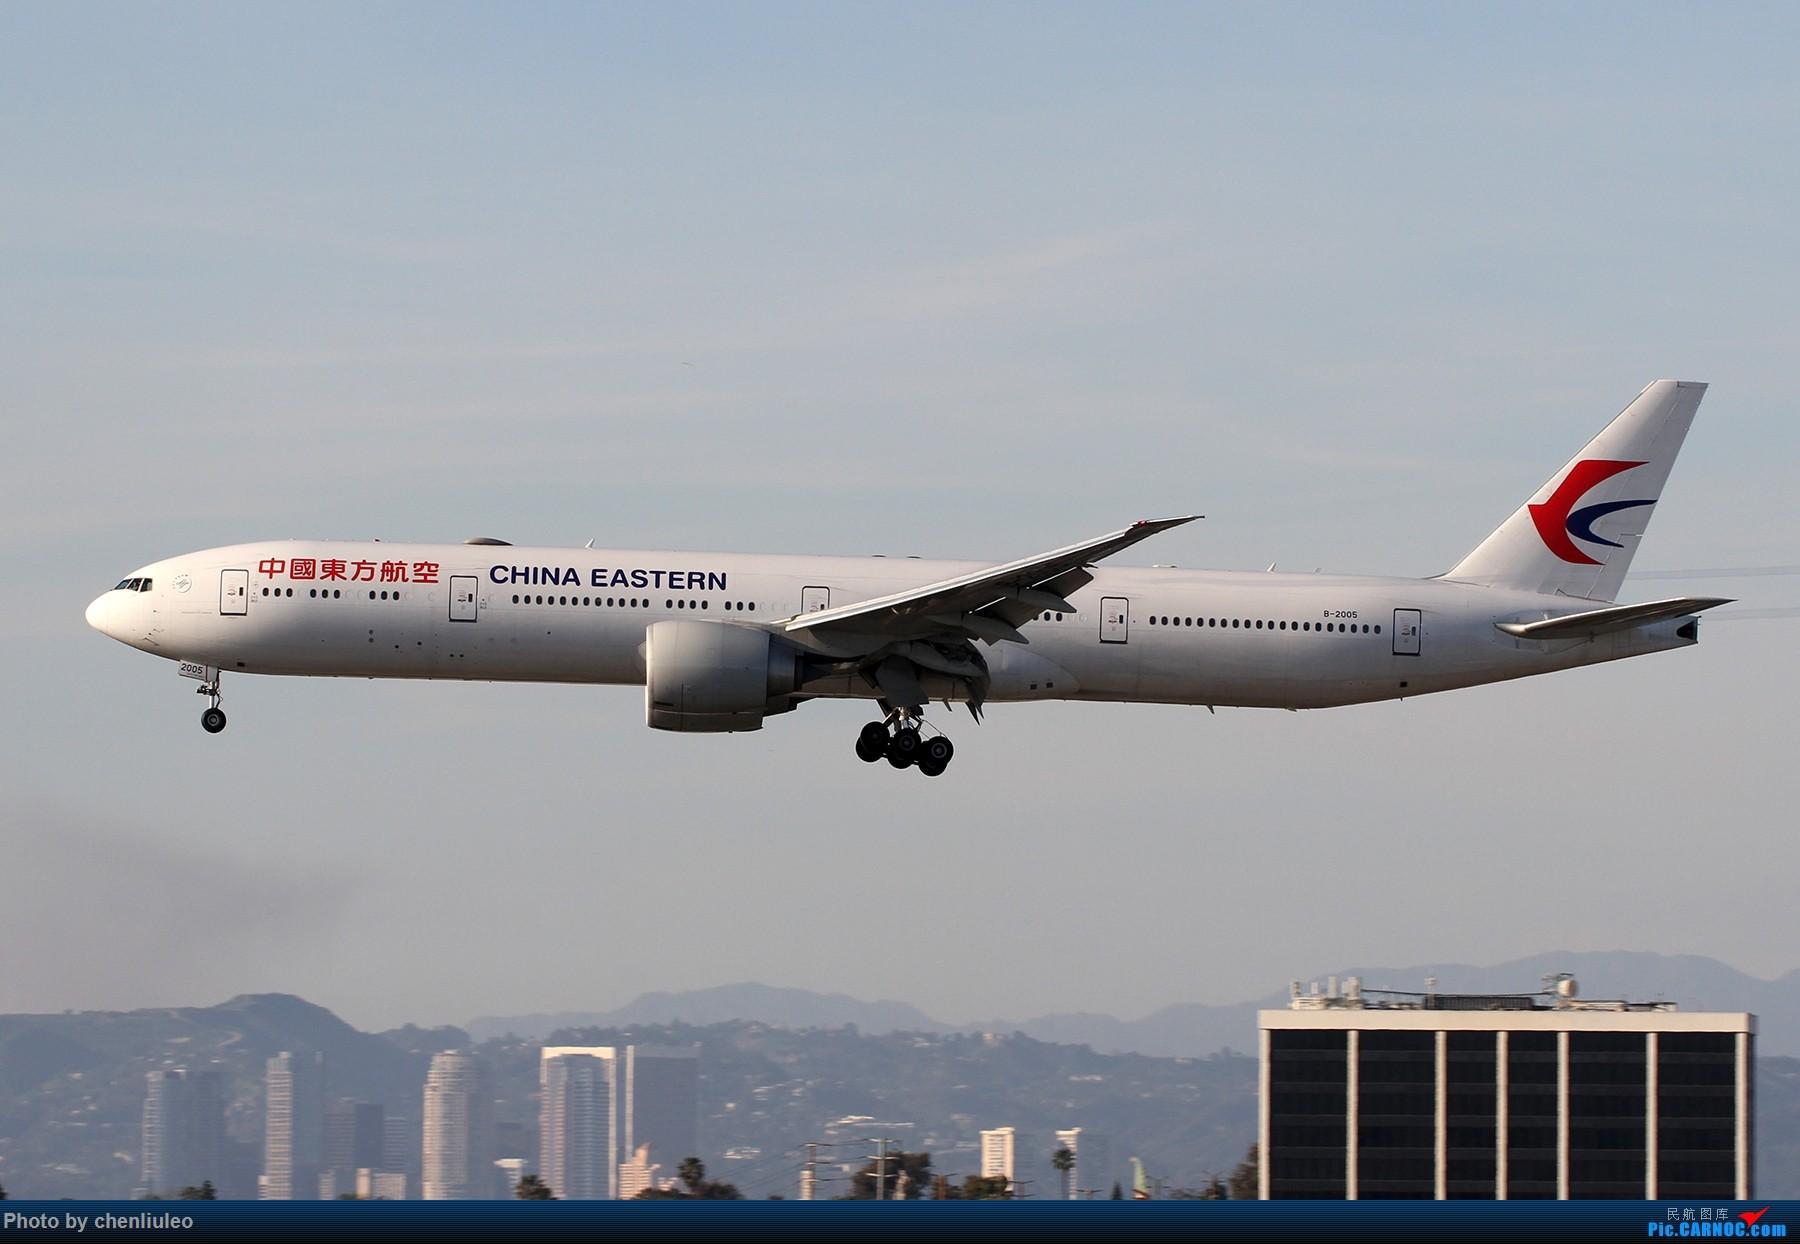 Re:[原创]【北美飞友会】全日空星球大战BB-8黄昏中降落LAX 以及一些杂图 BOEING 777-300ER B-2005 美国洛杉矶机场